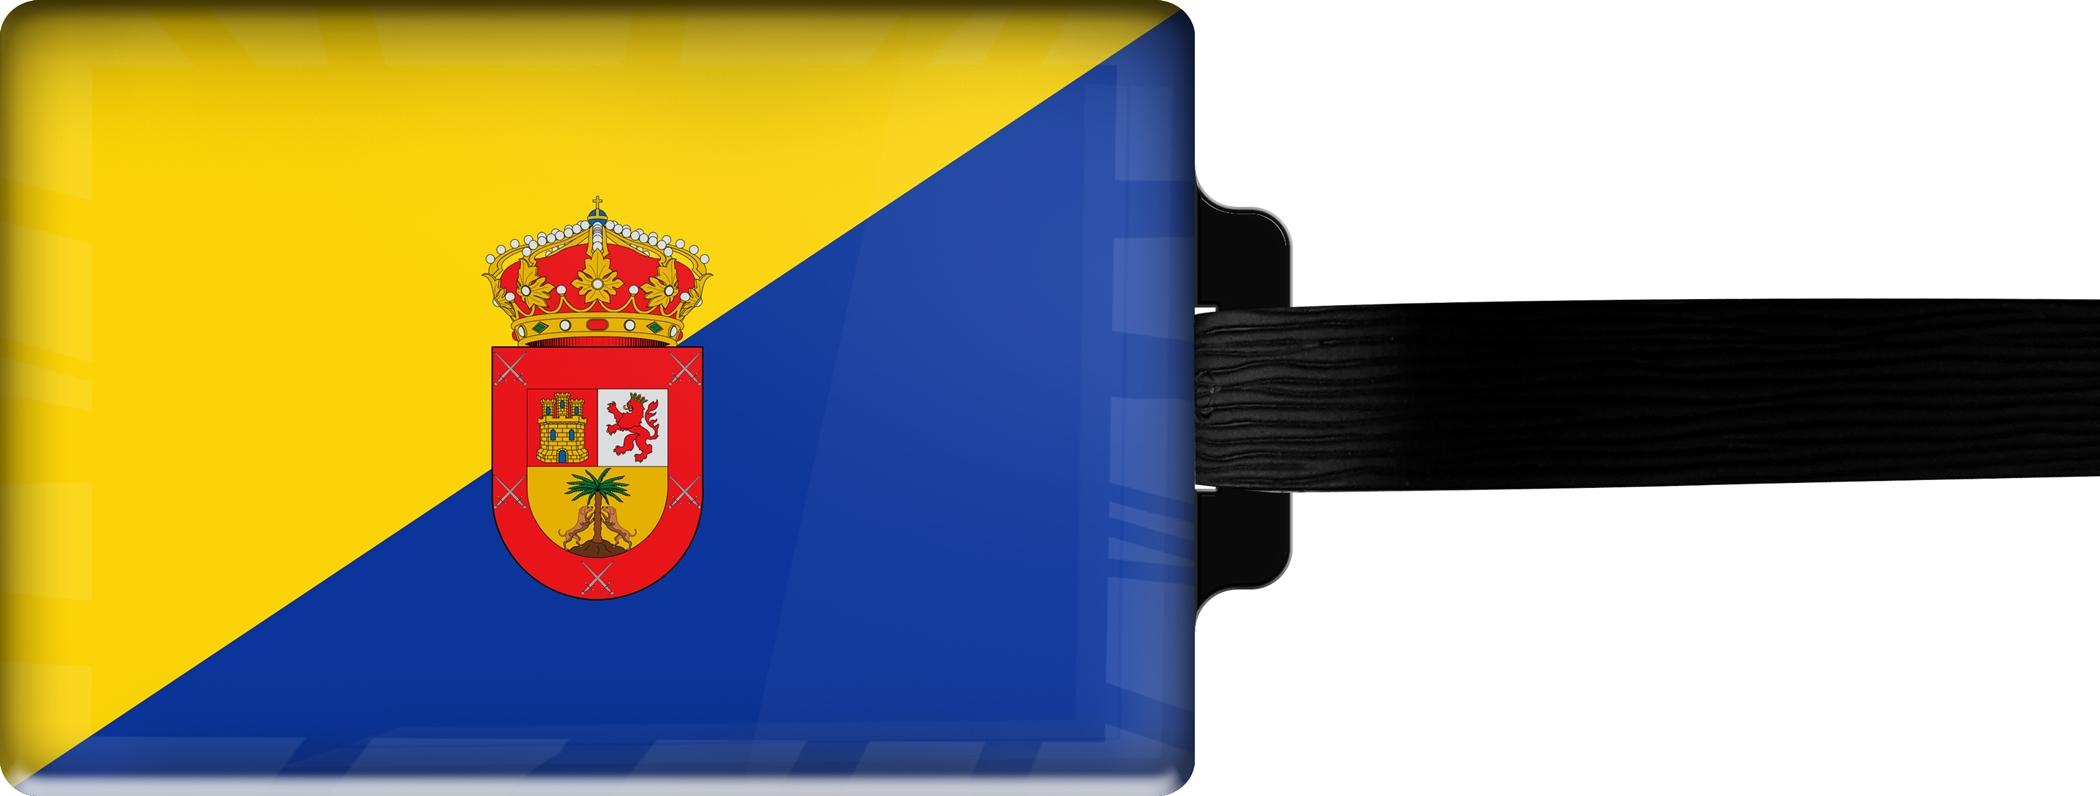 Hochwertiger Gepäckanhänger aus Acrylglas | FLAGGE GRAN CANARIA | metALUm #00094